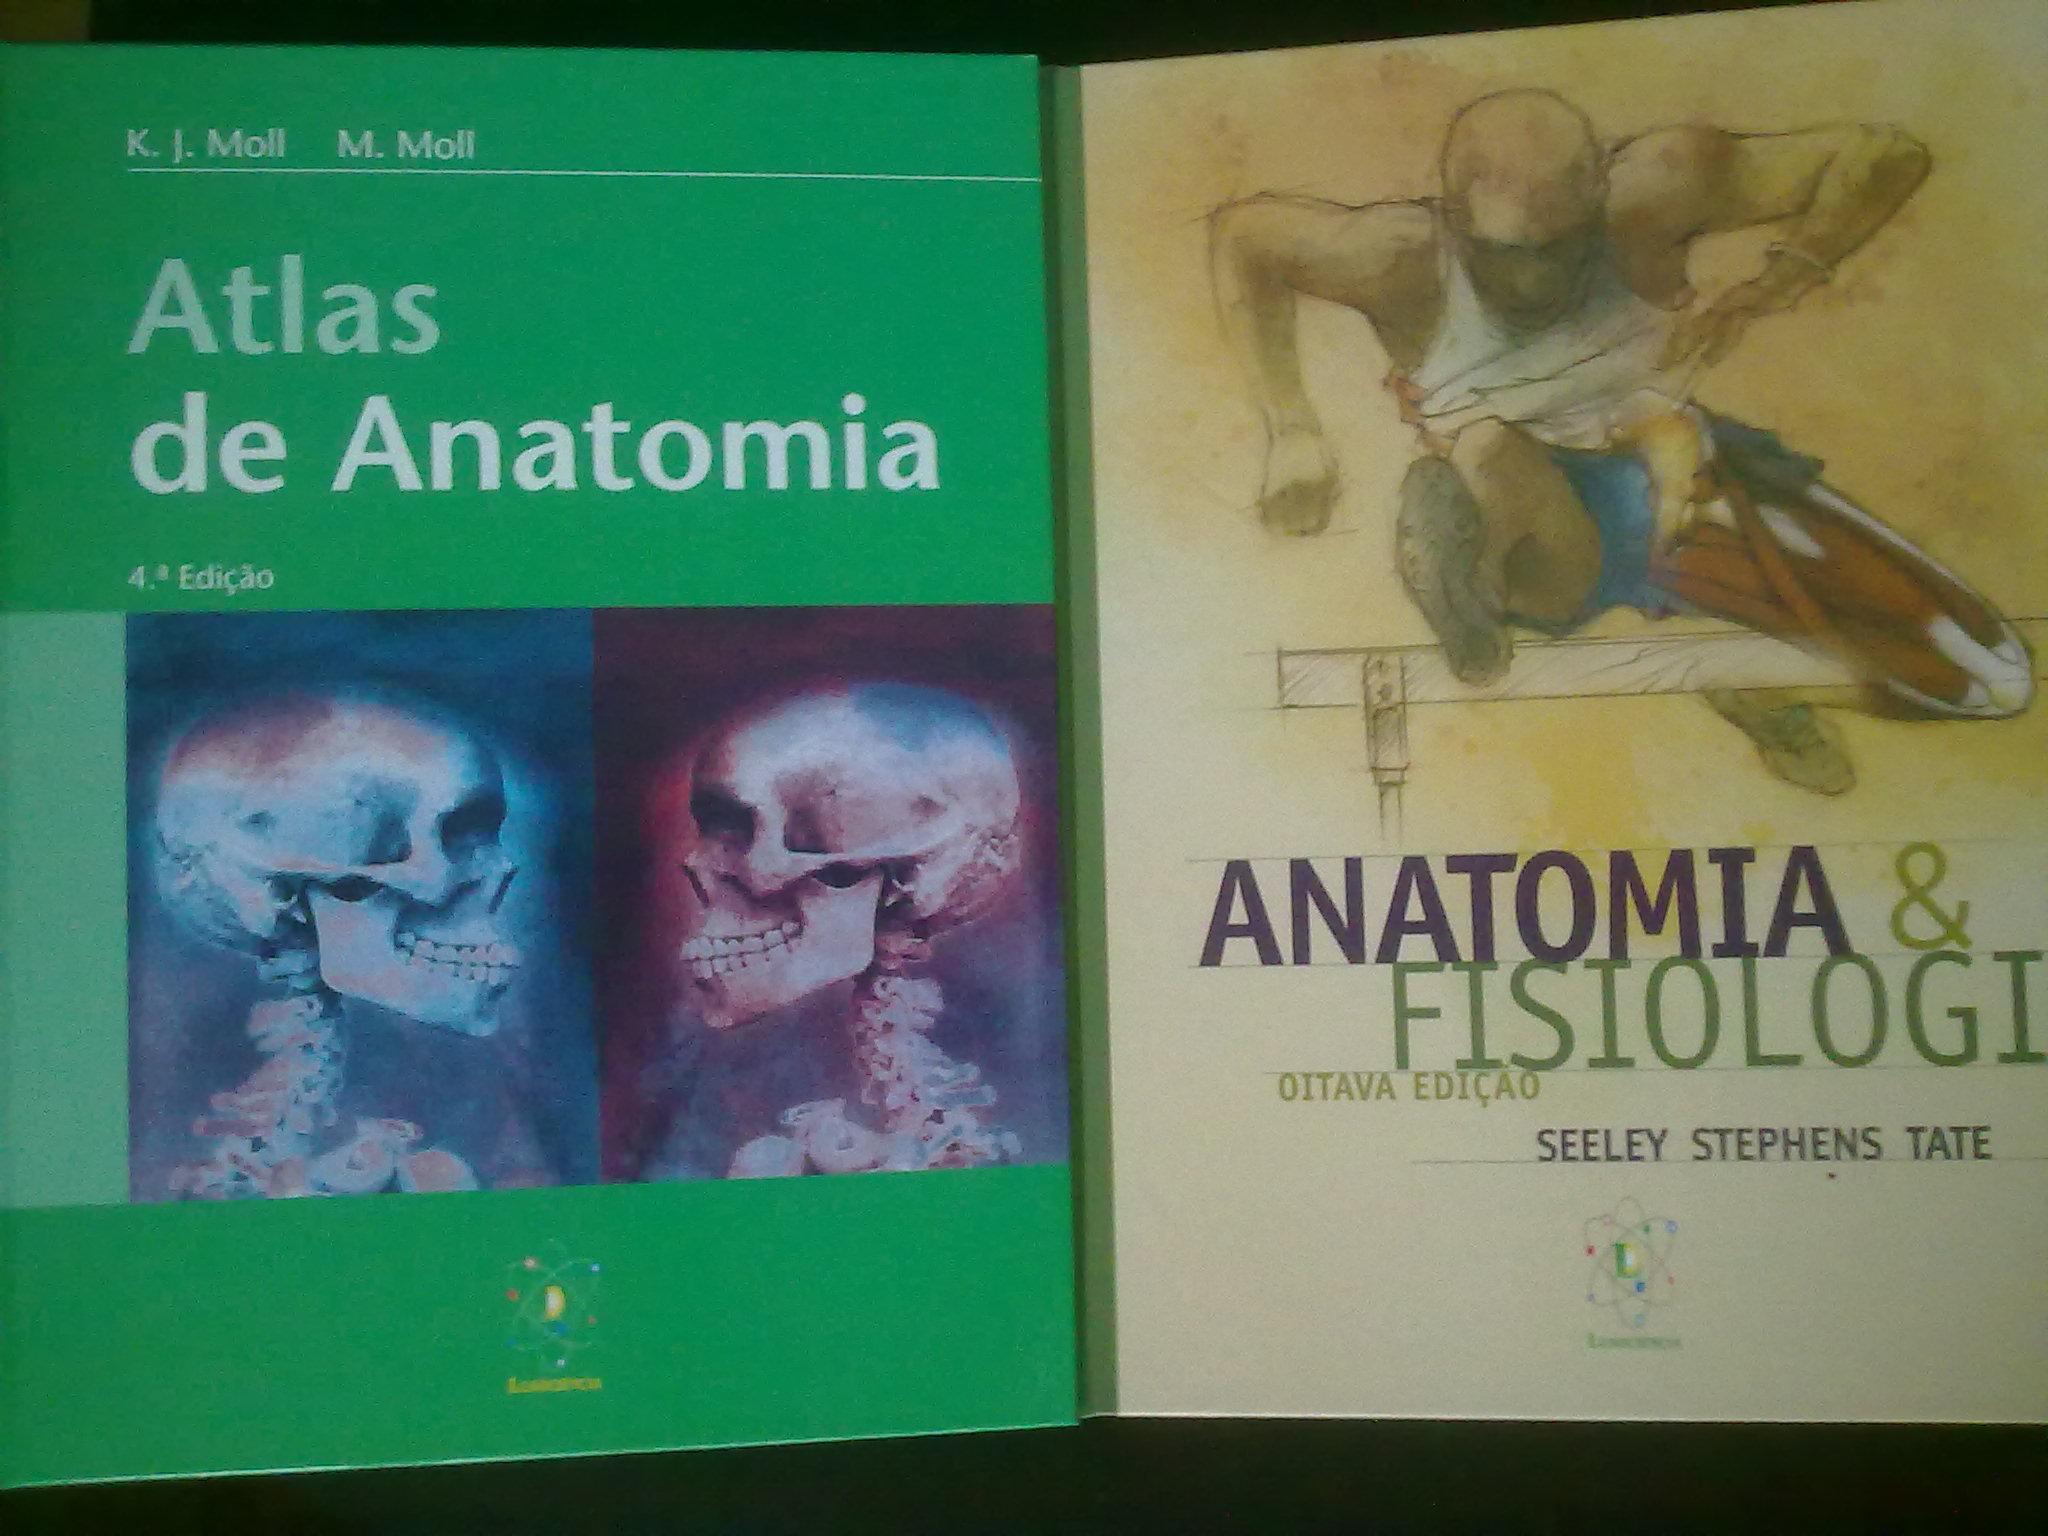 PACK ANATOMIA: Anatomia e Fisiologia seeley + G. de Estudo + Atlas ...